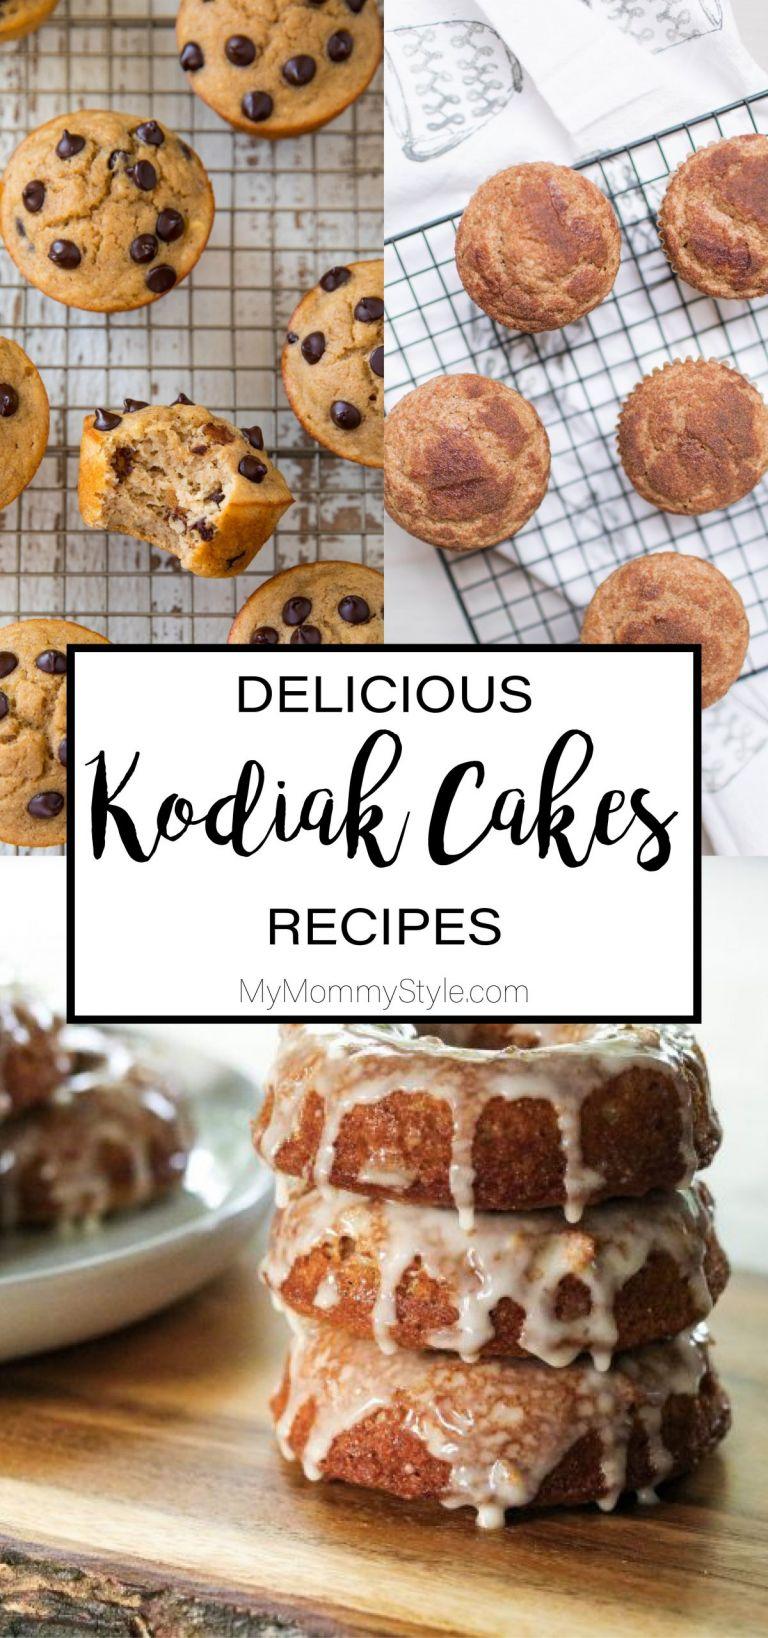 delicious Kodiak Cakes recipes